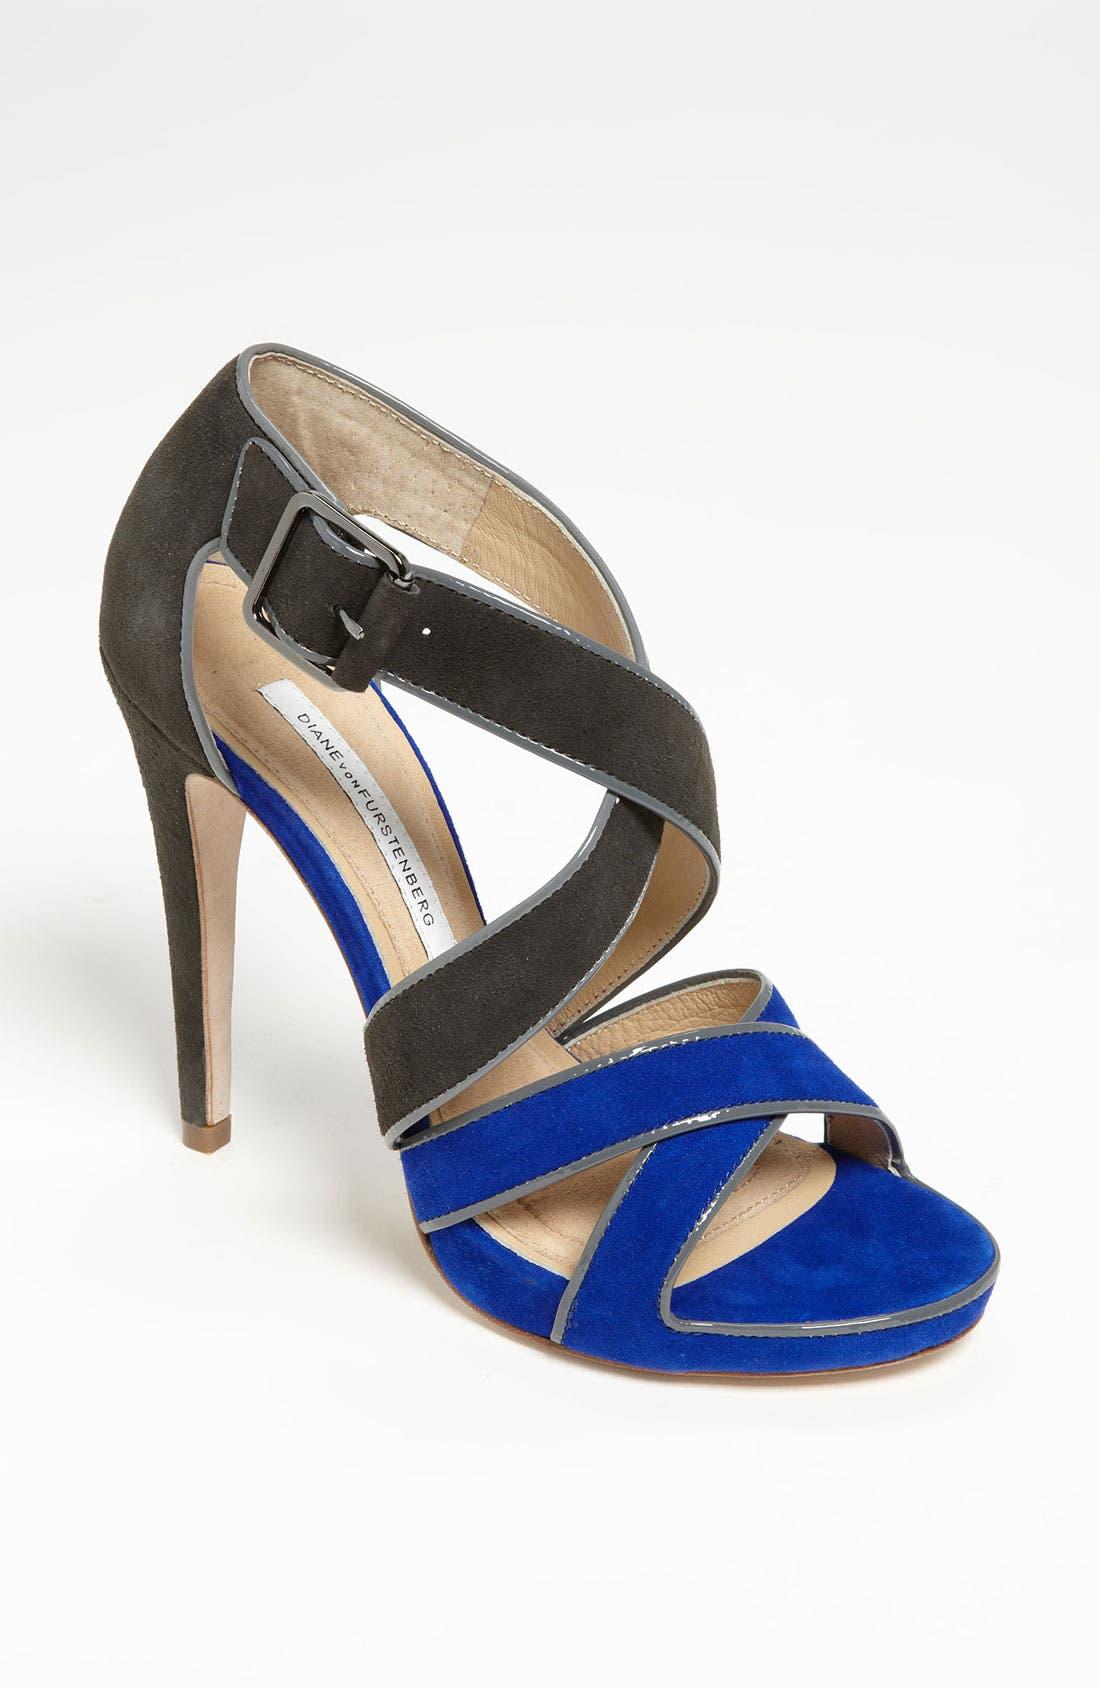 Alternate Image 1 Selected - Diane von Furstenberg 'Jodi' Sandal